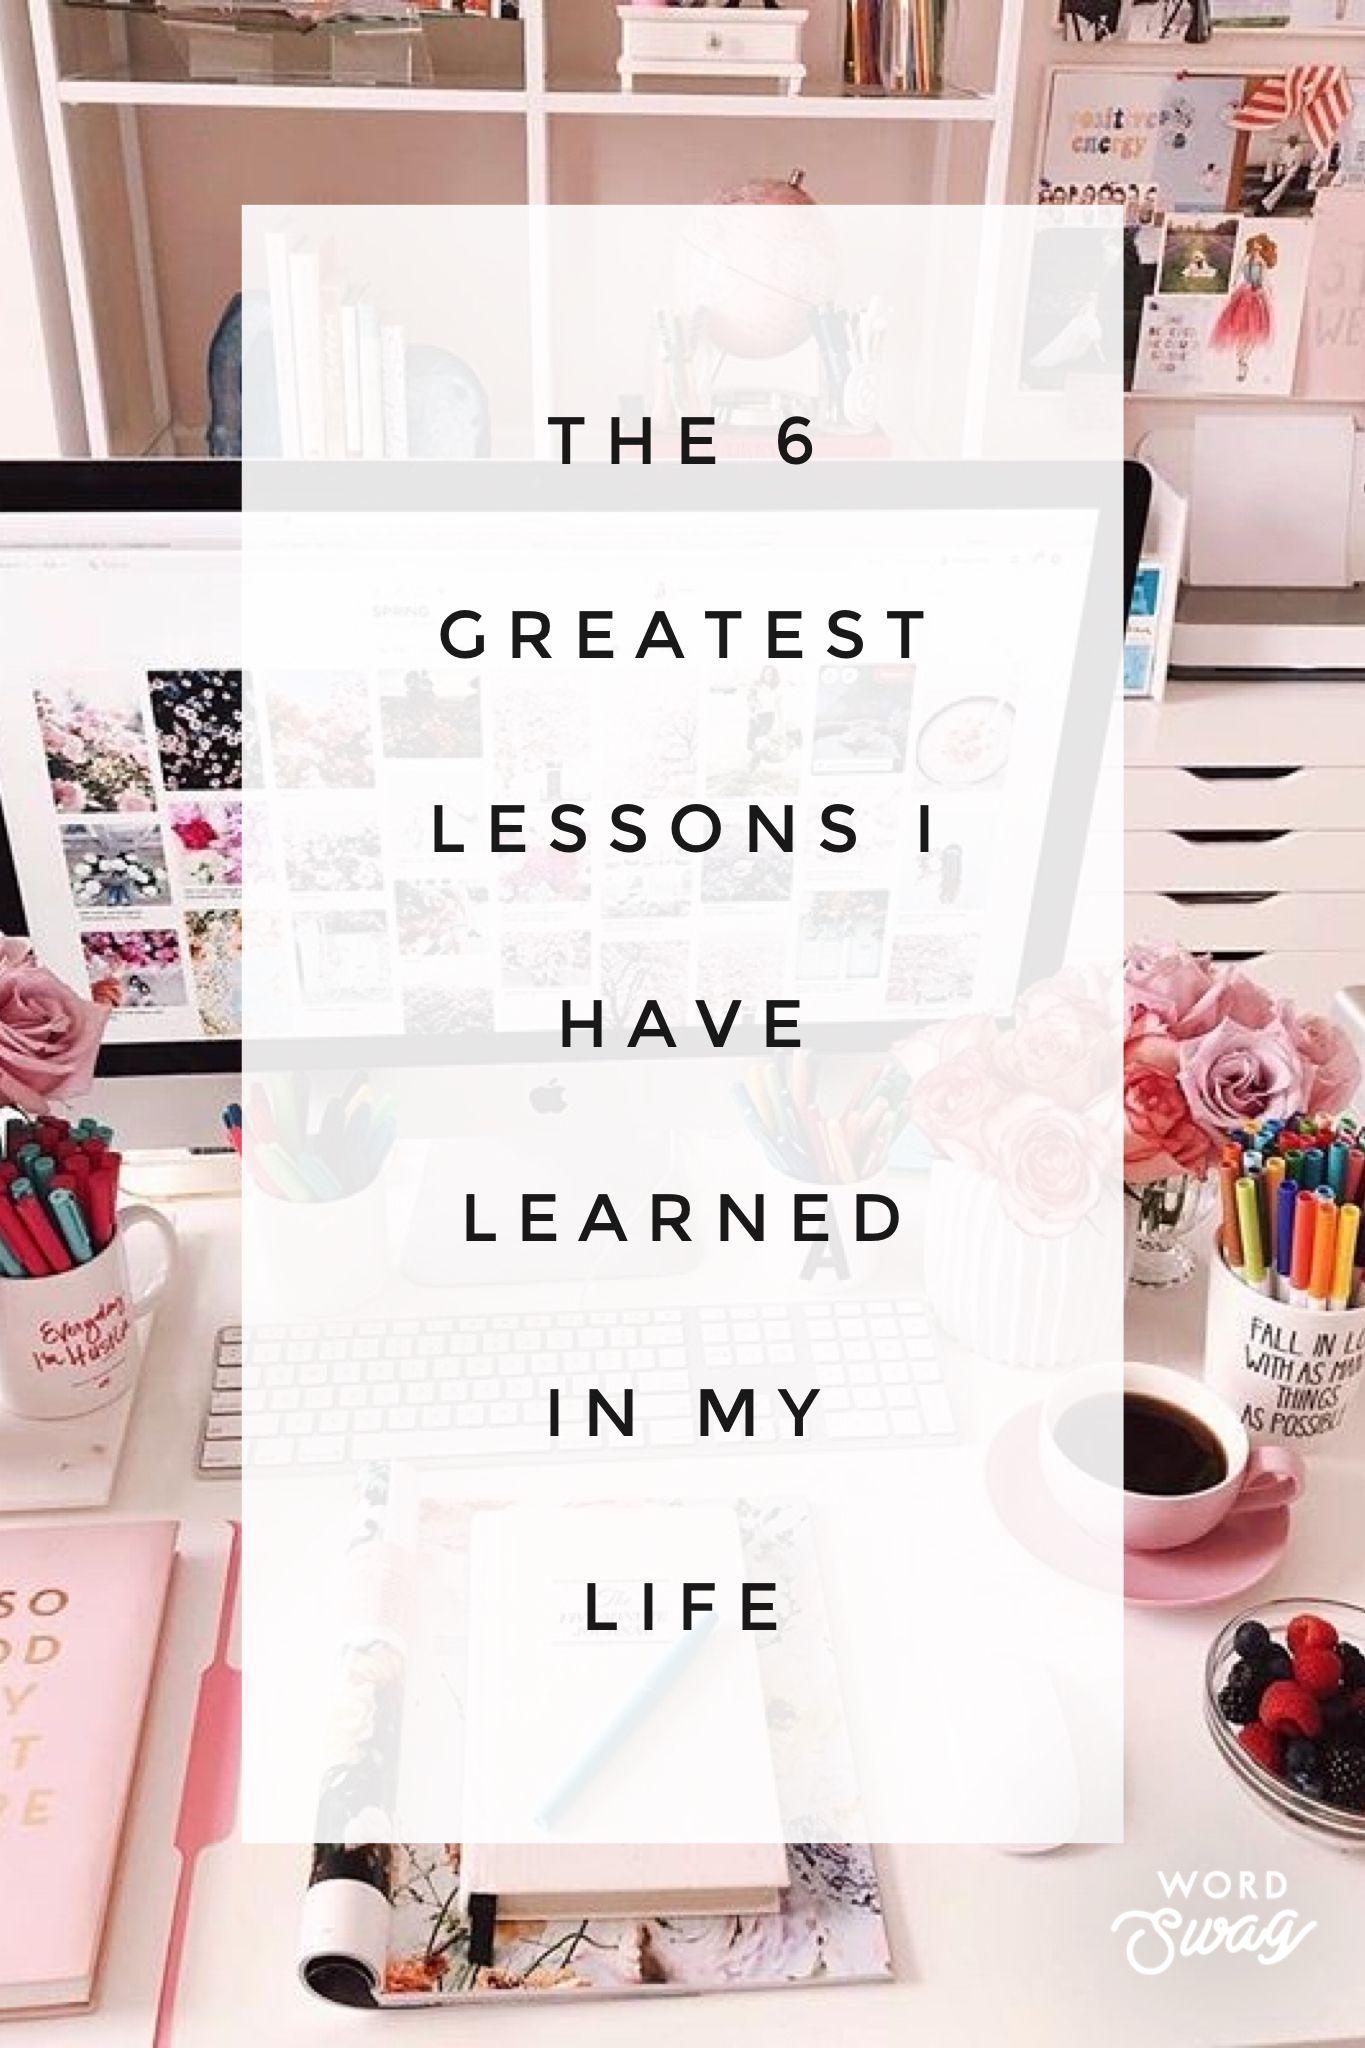 #lifelessons #advice #lifestyleblog #blogger #lifestylegoals